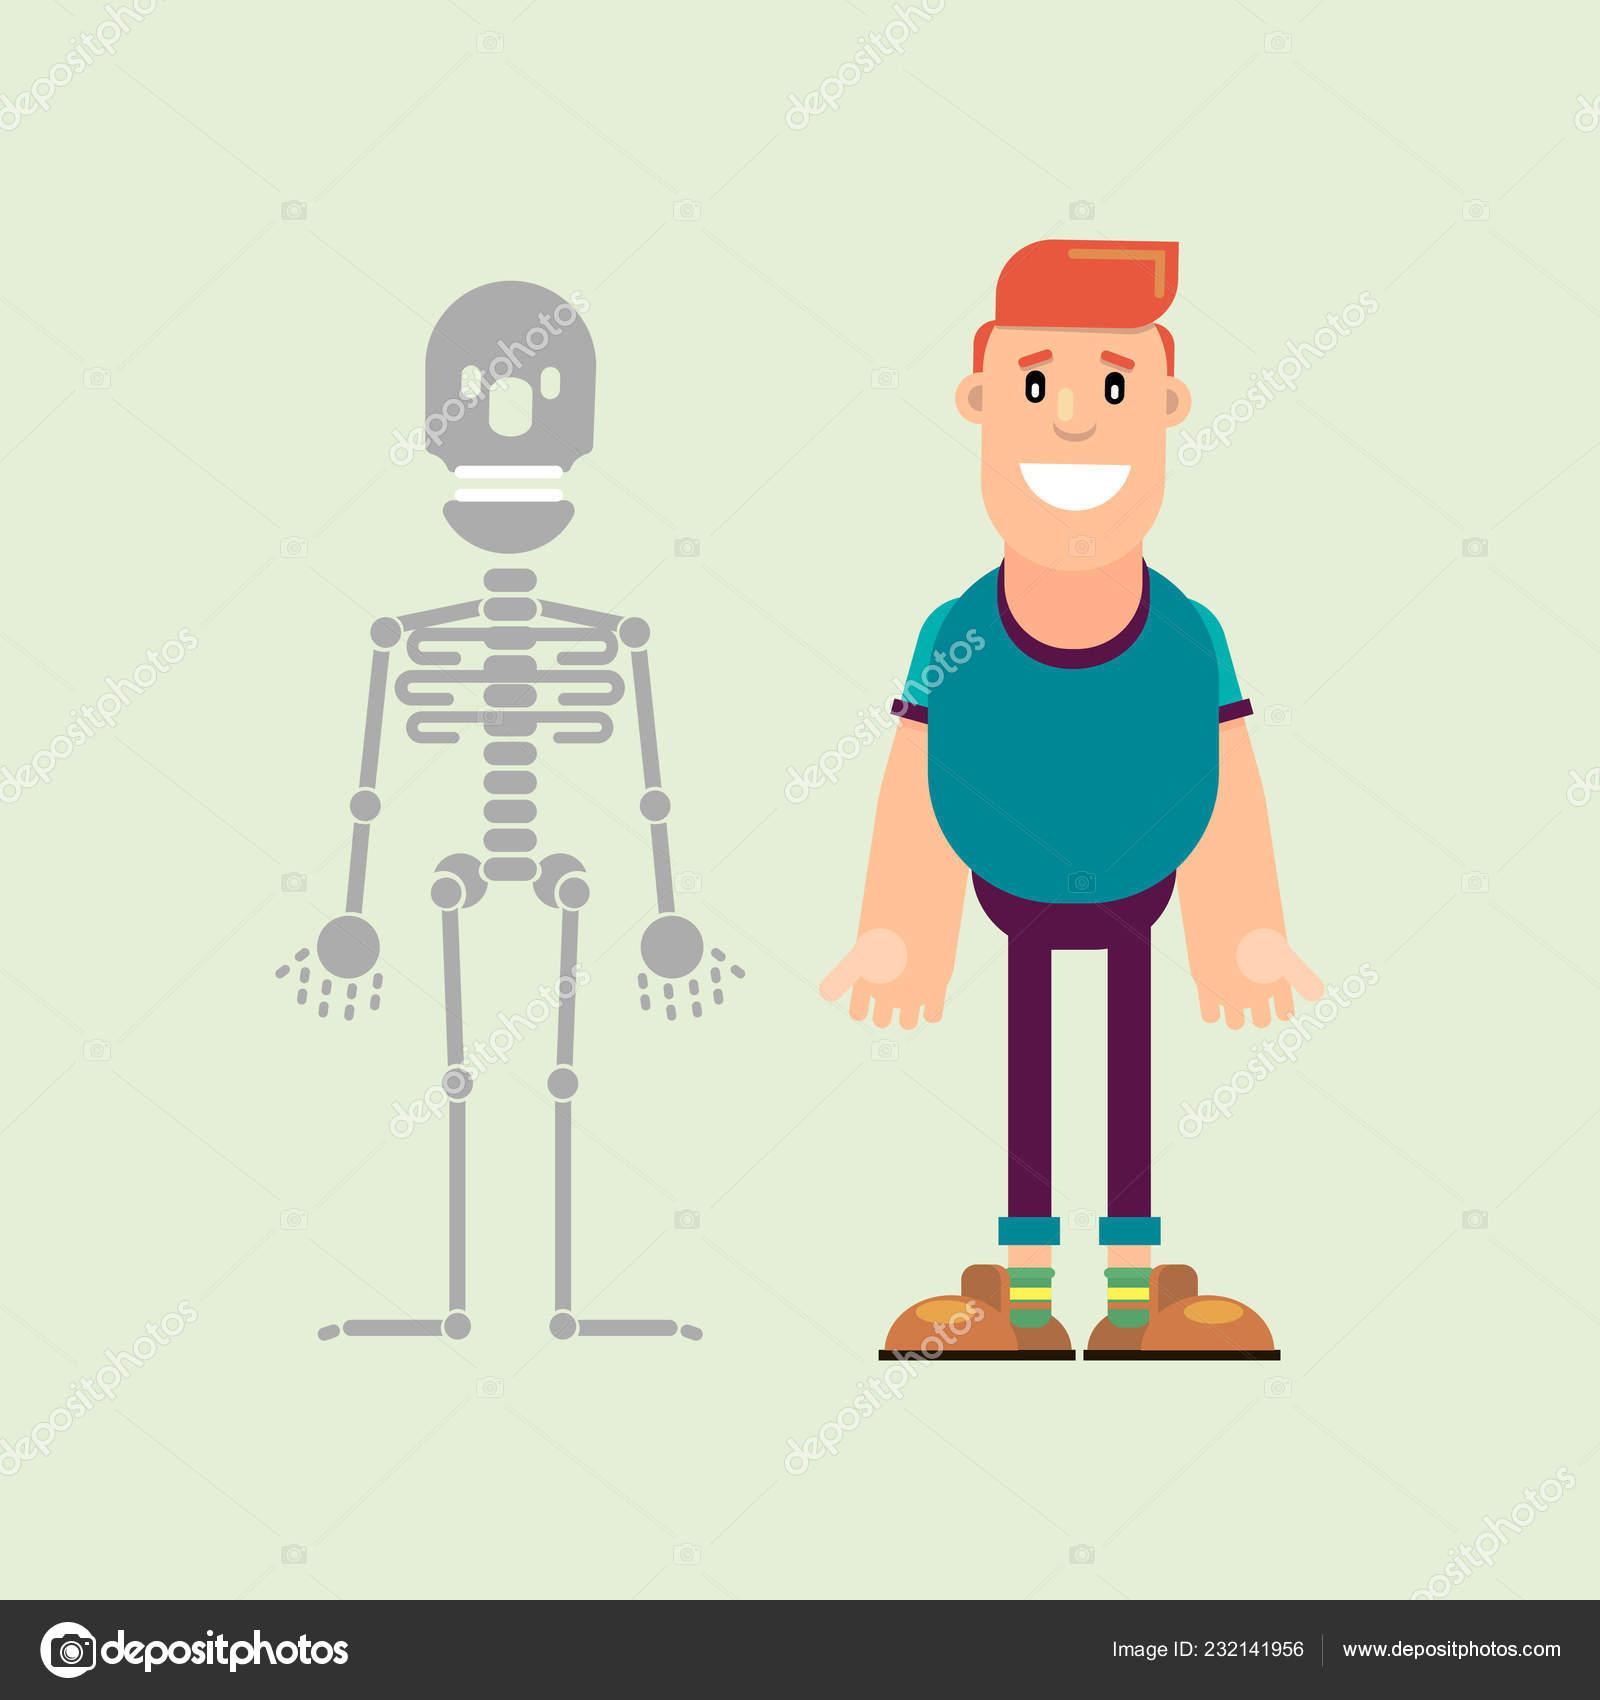 Man Male Skeleton Visual Aid Human Anatomy Vector